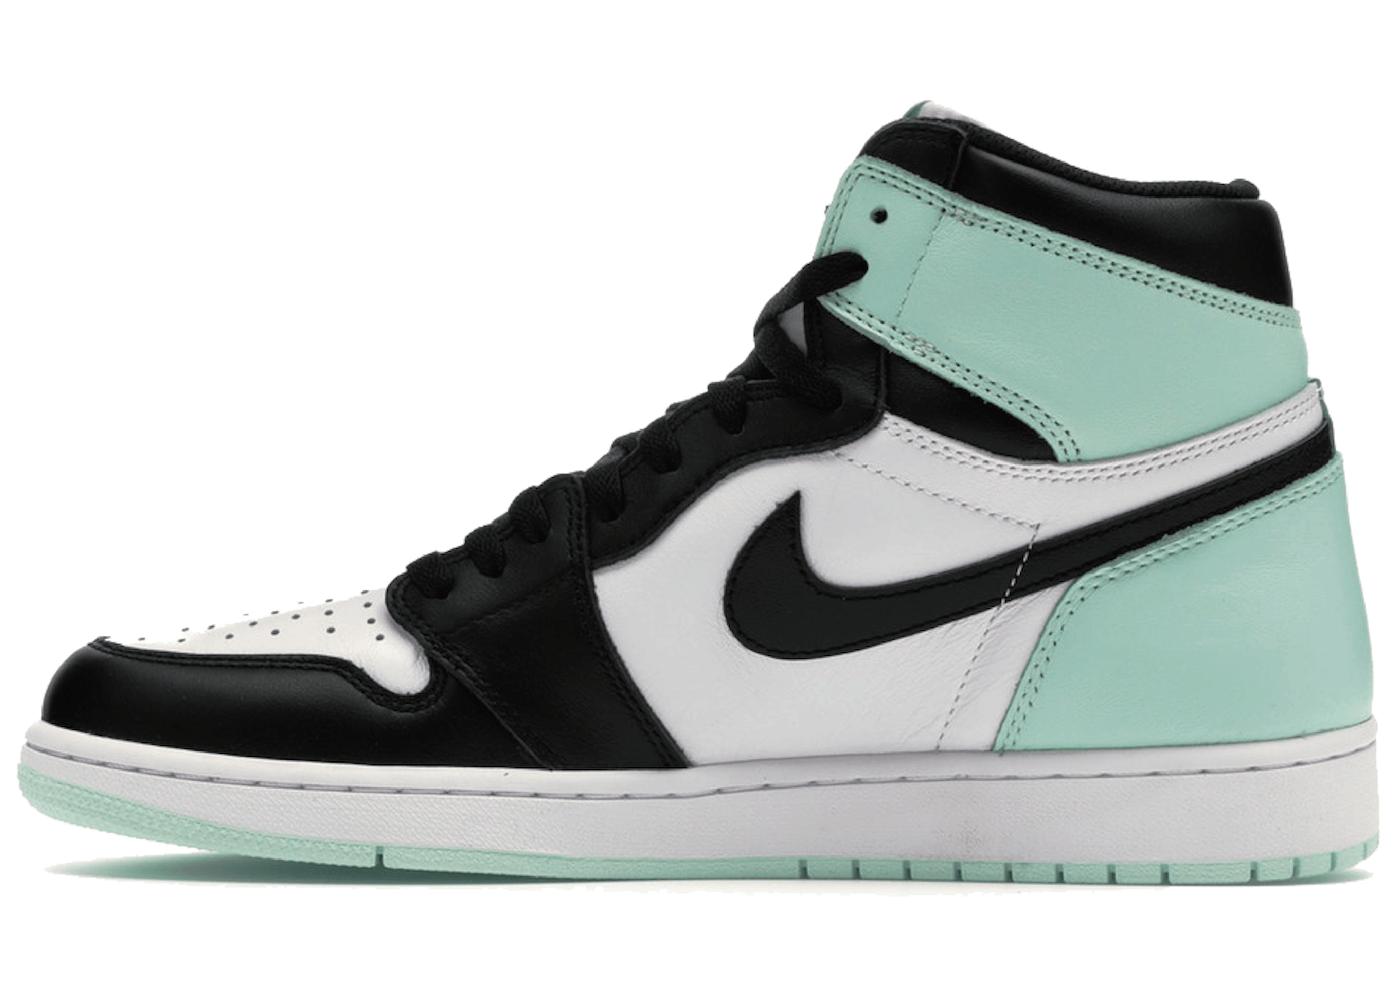 Nike Air Jordan 1 Retro High OG NRG Iglooの写真